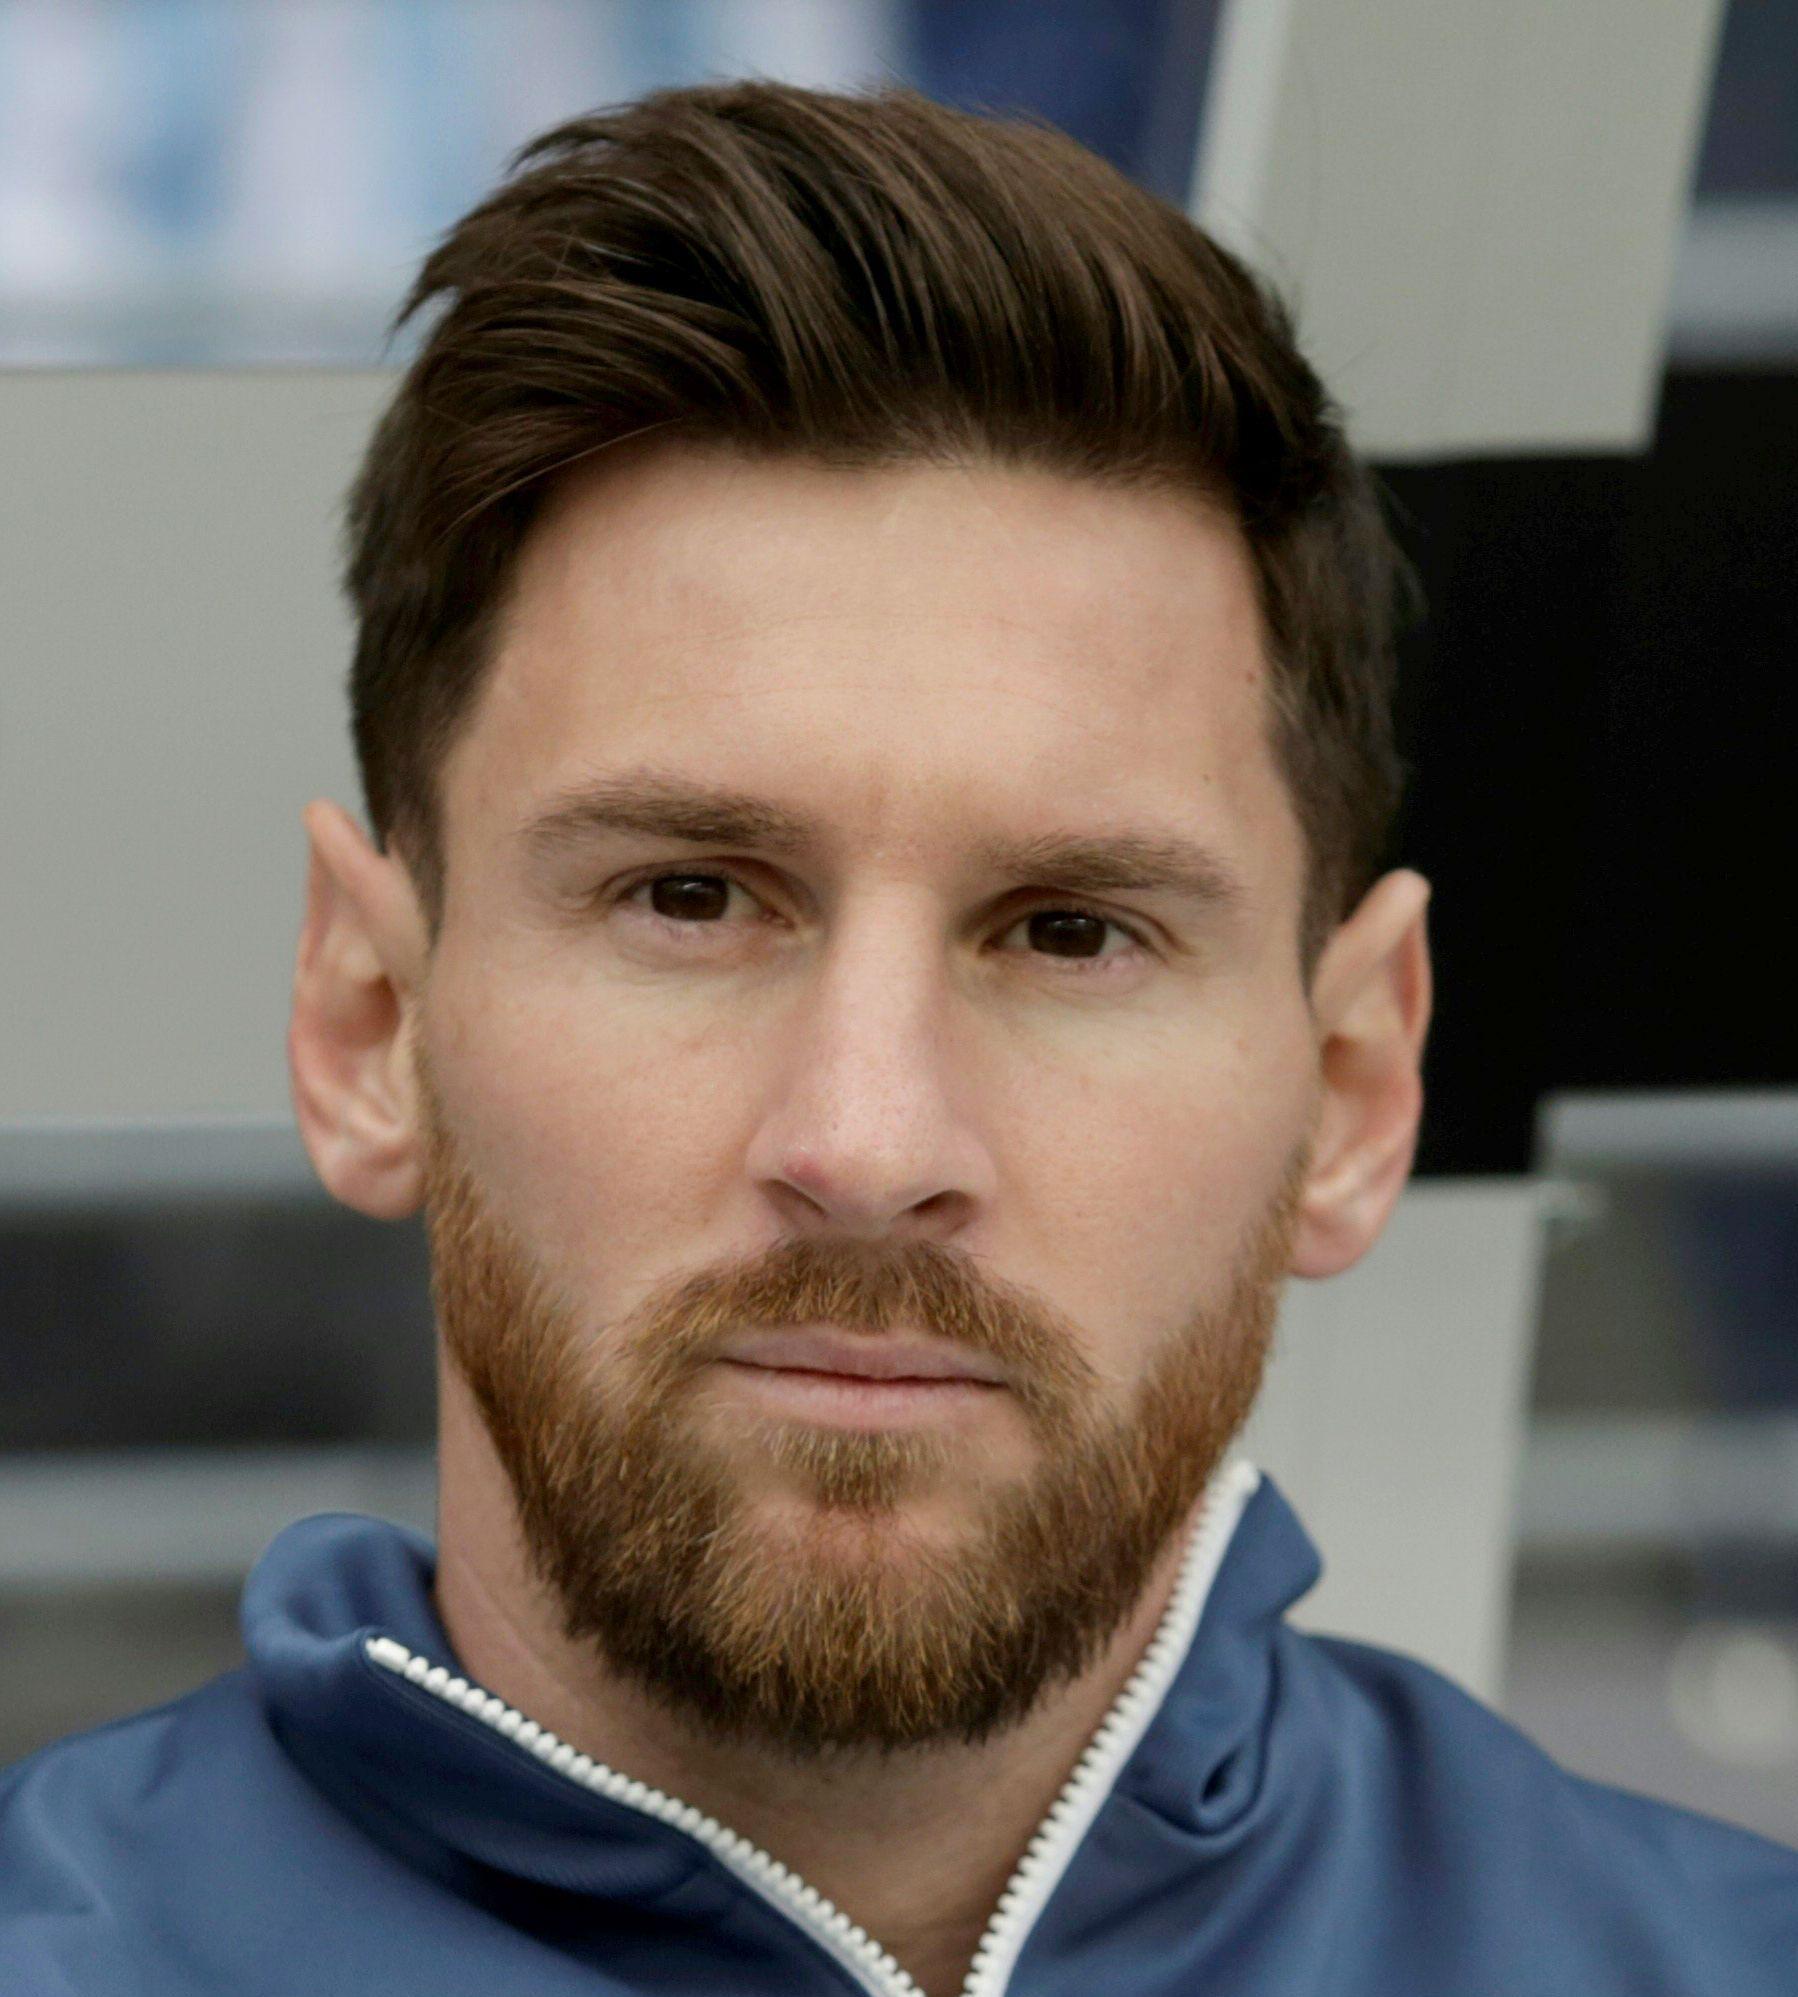 1. Classic Men's Hair. Lionel Messi Haircut